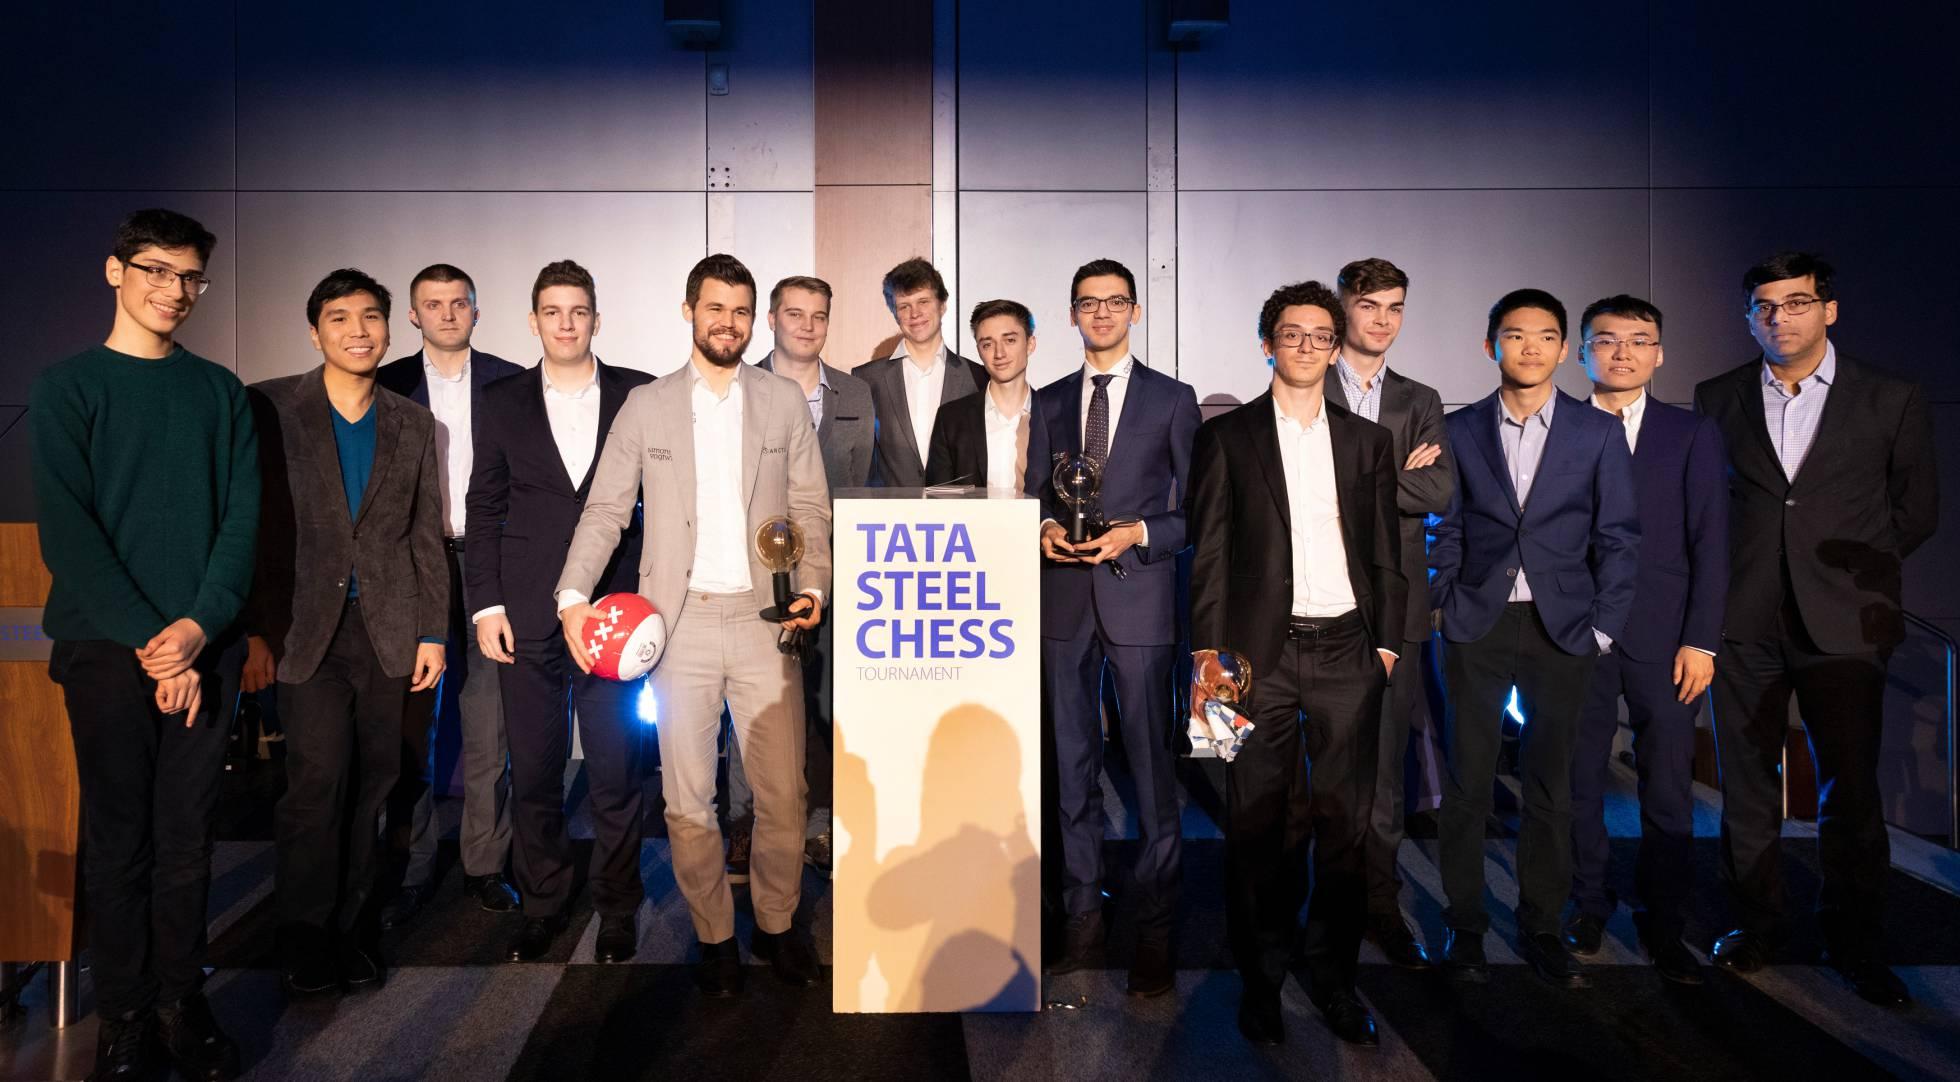 Los catorce participantes: Firouzja, So, Vitiugov, Duda, Carlsen, Kovalev, Artémiev, Dúbov, Giri, Caruana, Van Foreest, Xiong, Yu y Anand